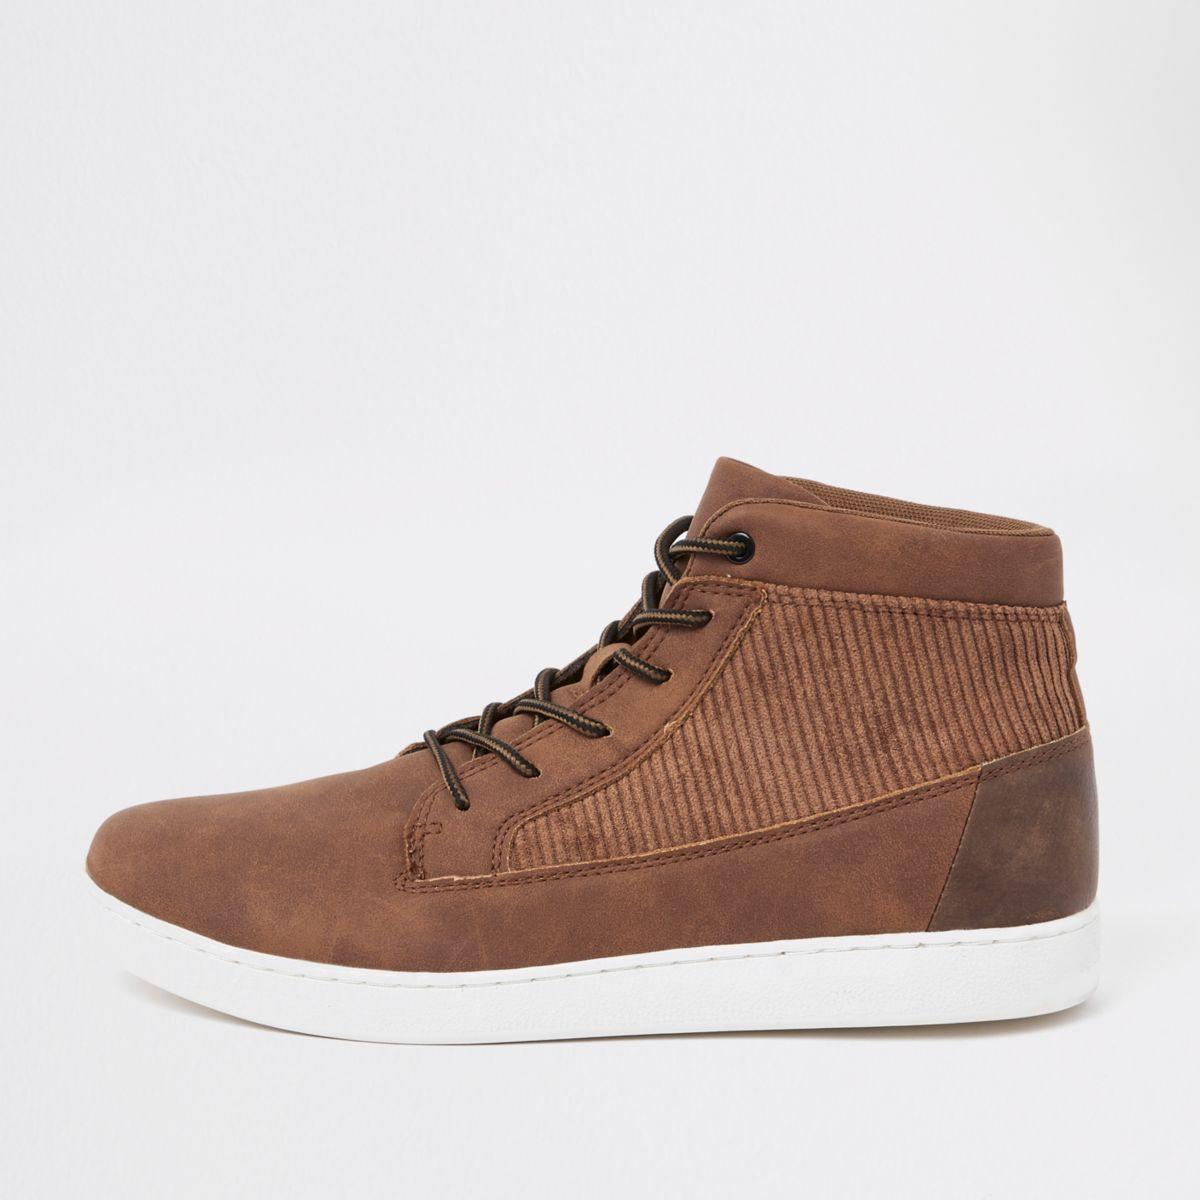 Tan mid top cord panel sneakers